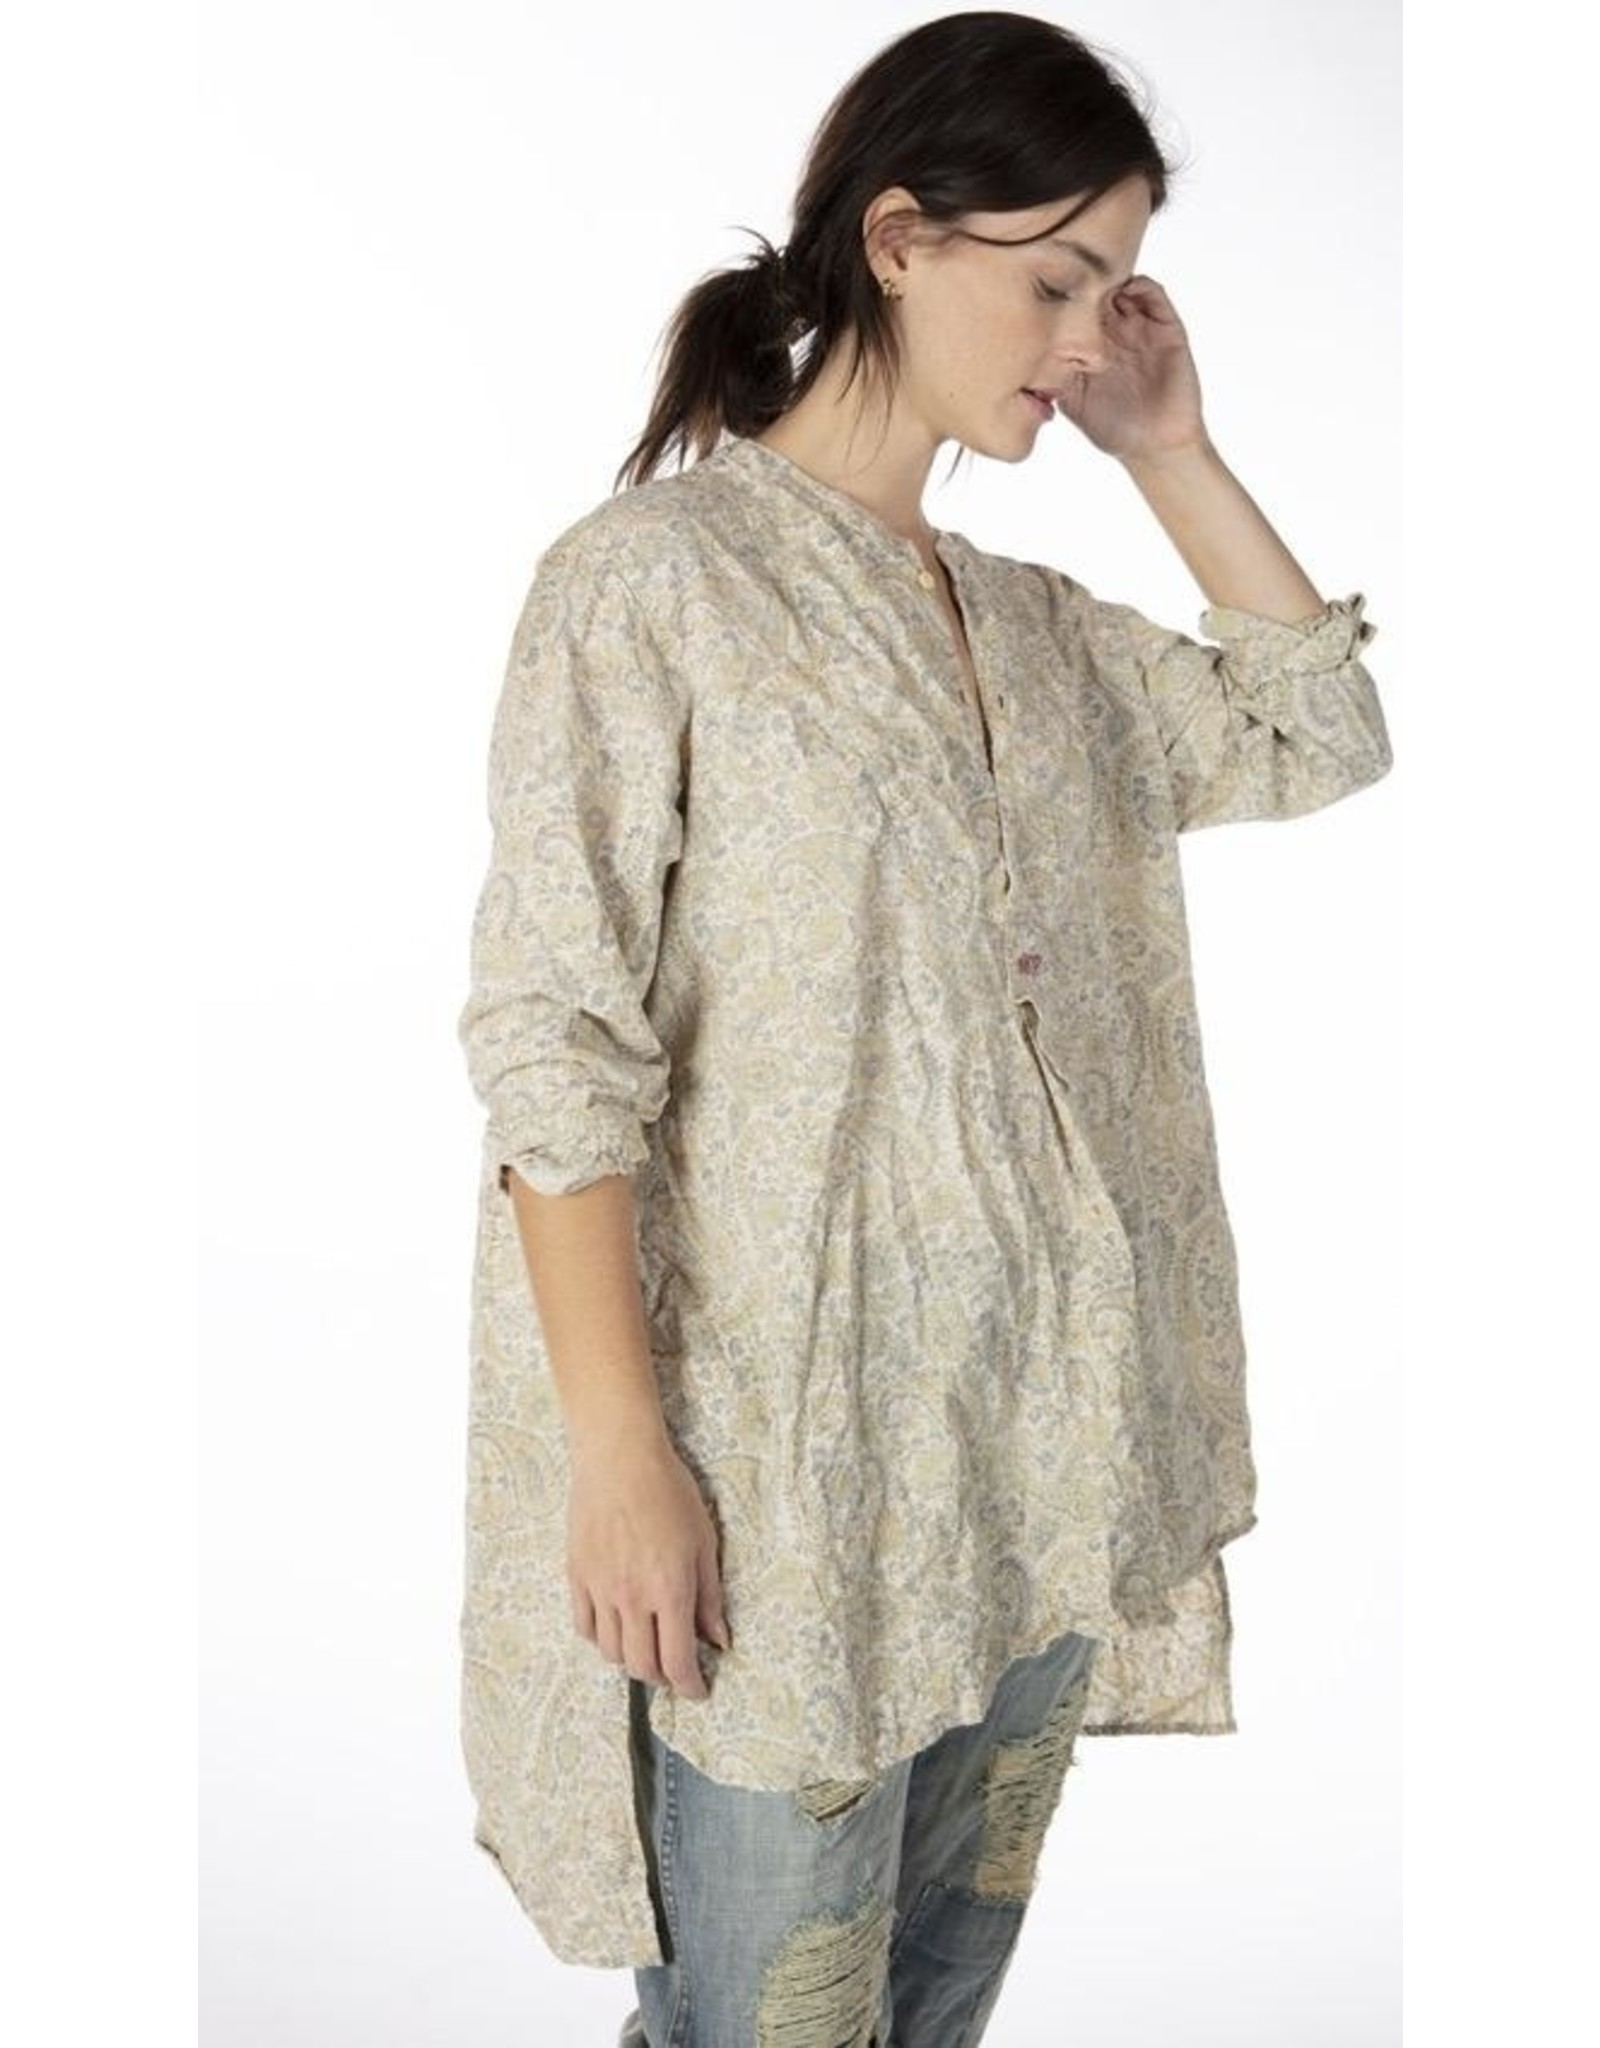 Magnolia Pearl Ines Classic Shirt - Fleuri